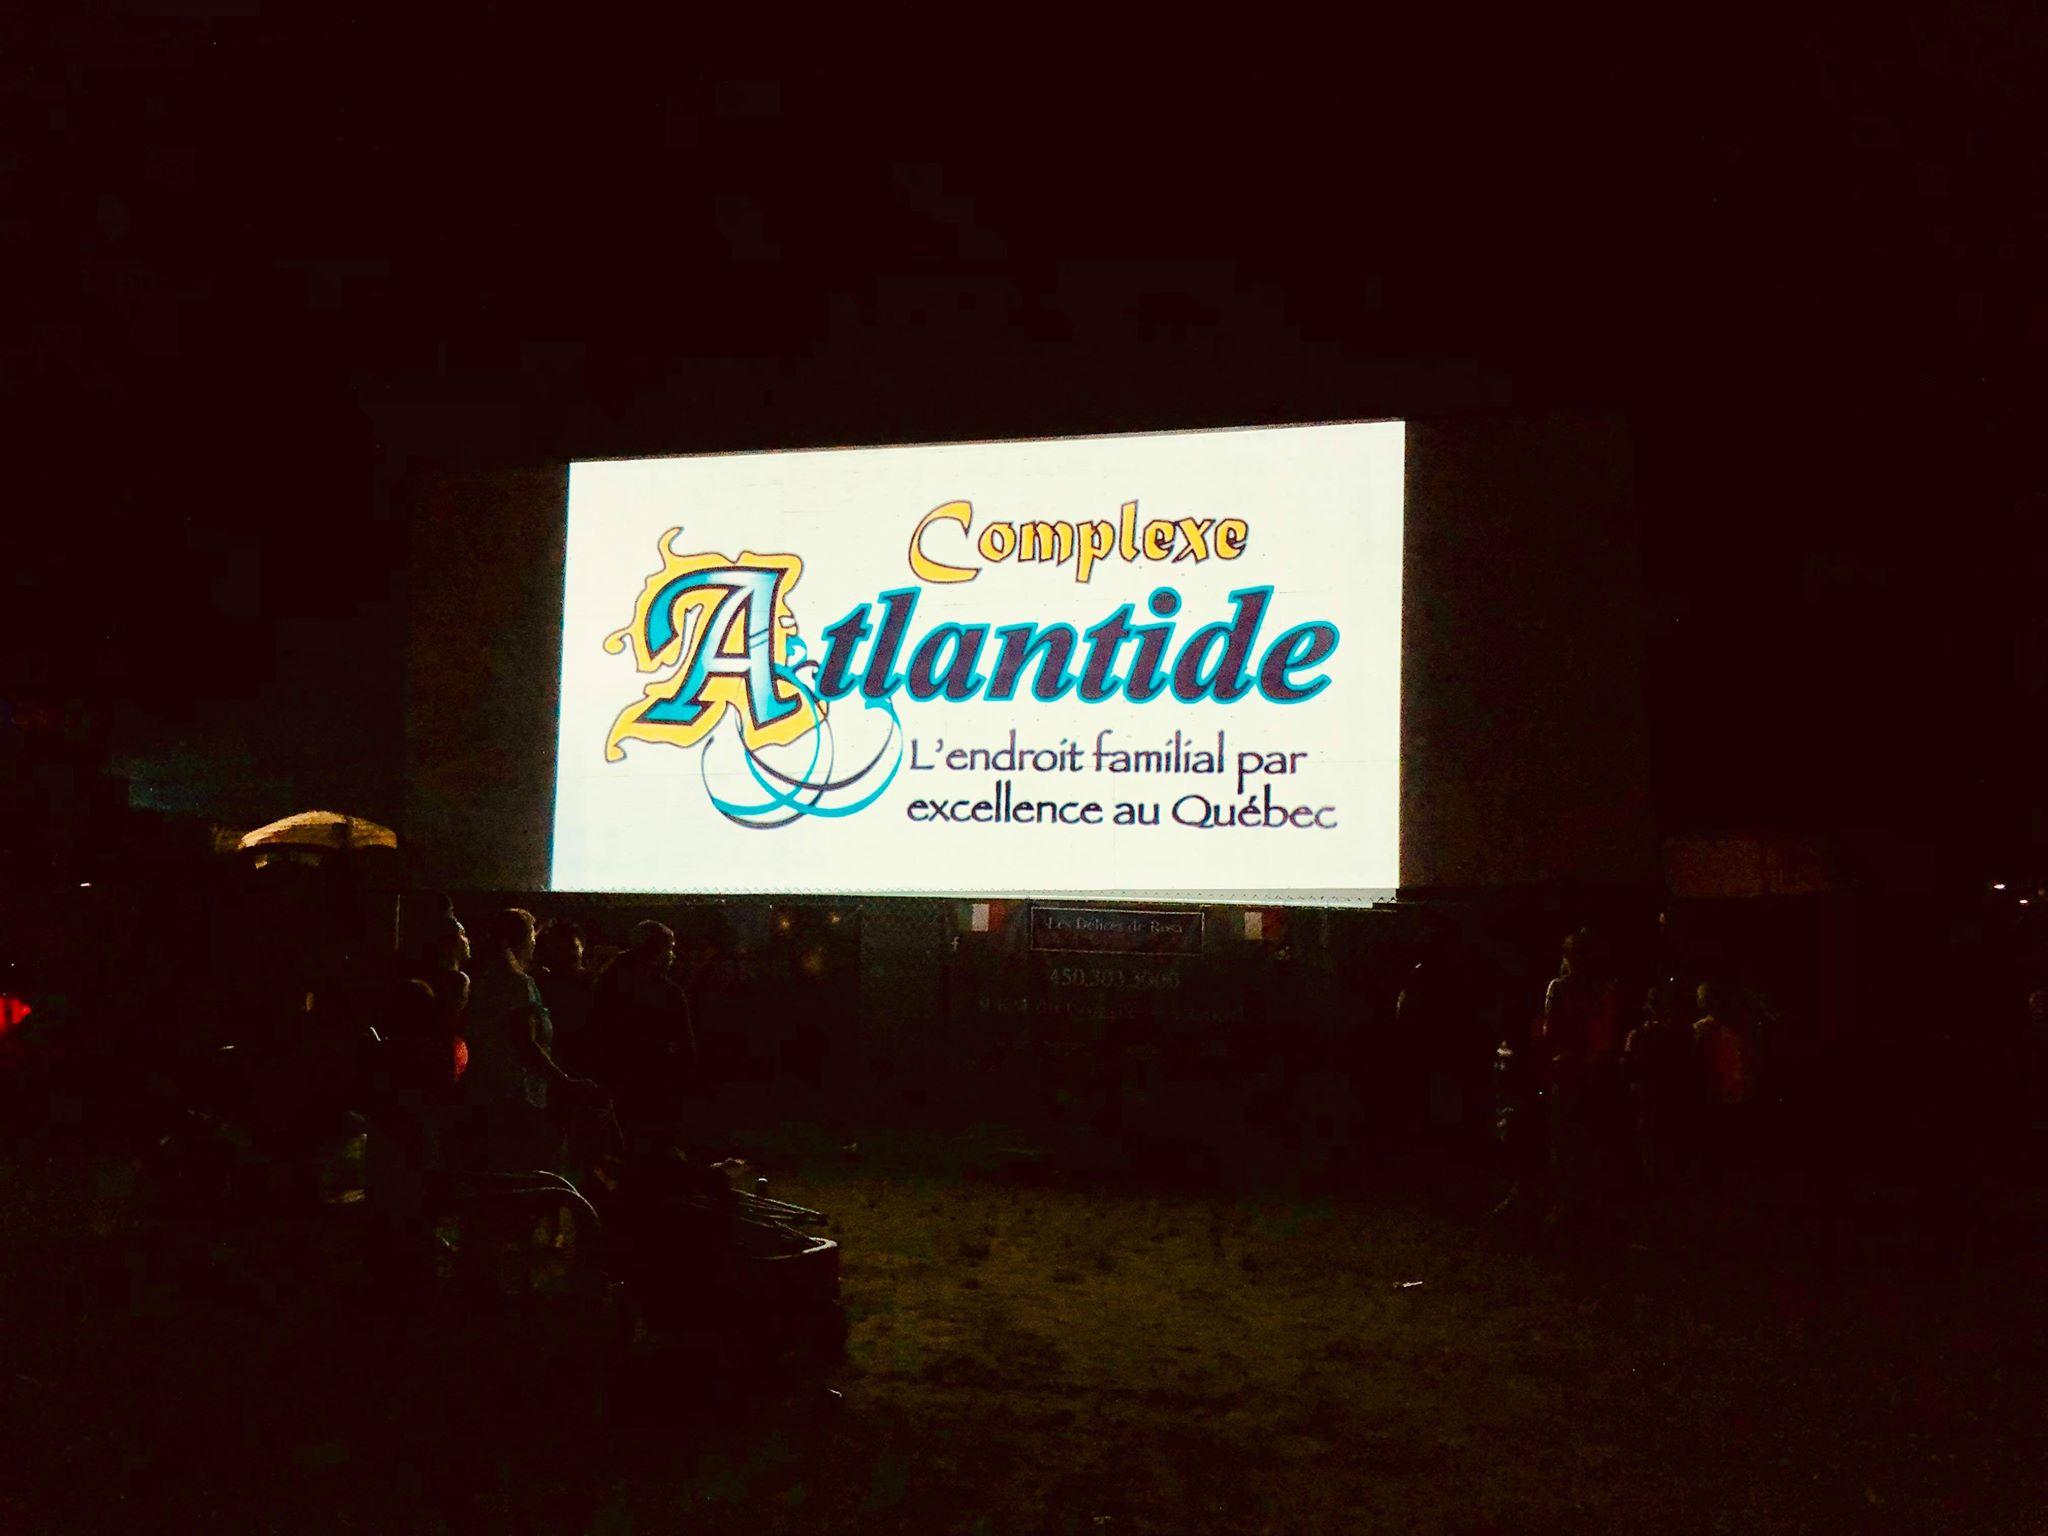 http://www.campingatlantide.com/wp-content/uploads/2019/07/alterego-showband-complexe-atlantide-2019-5.jpg